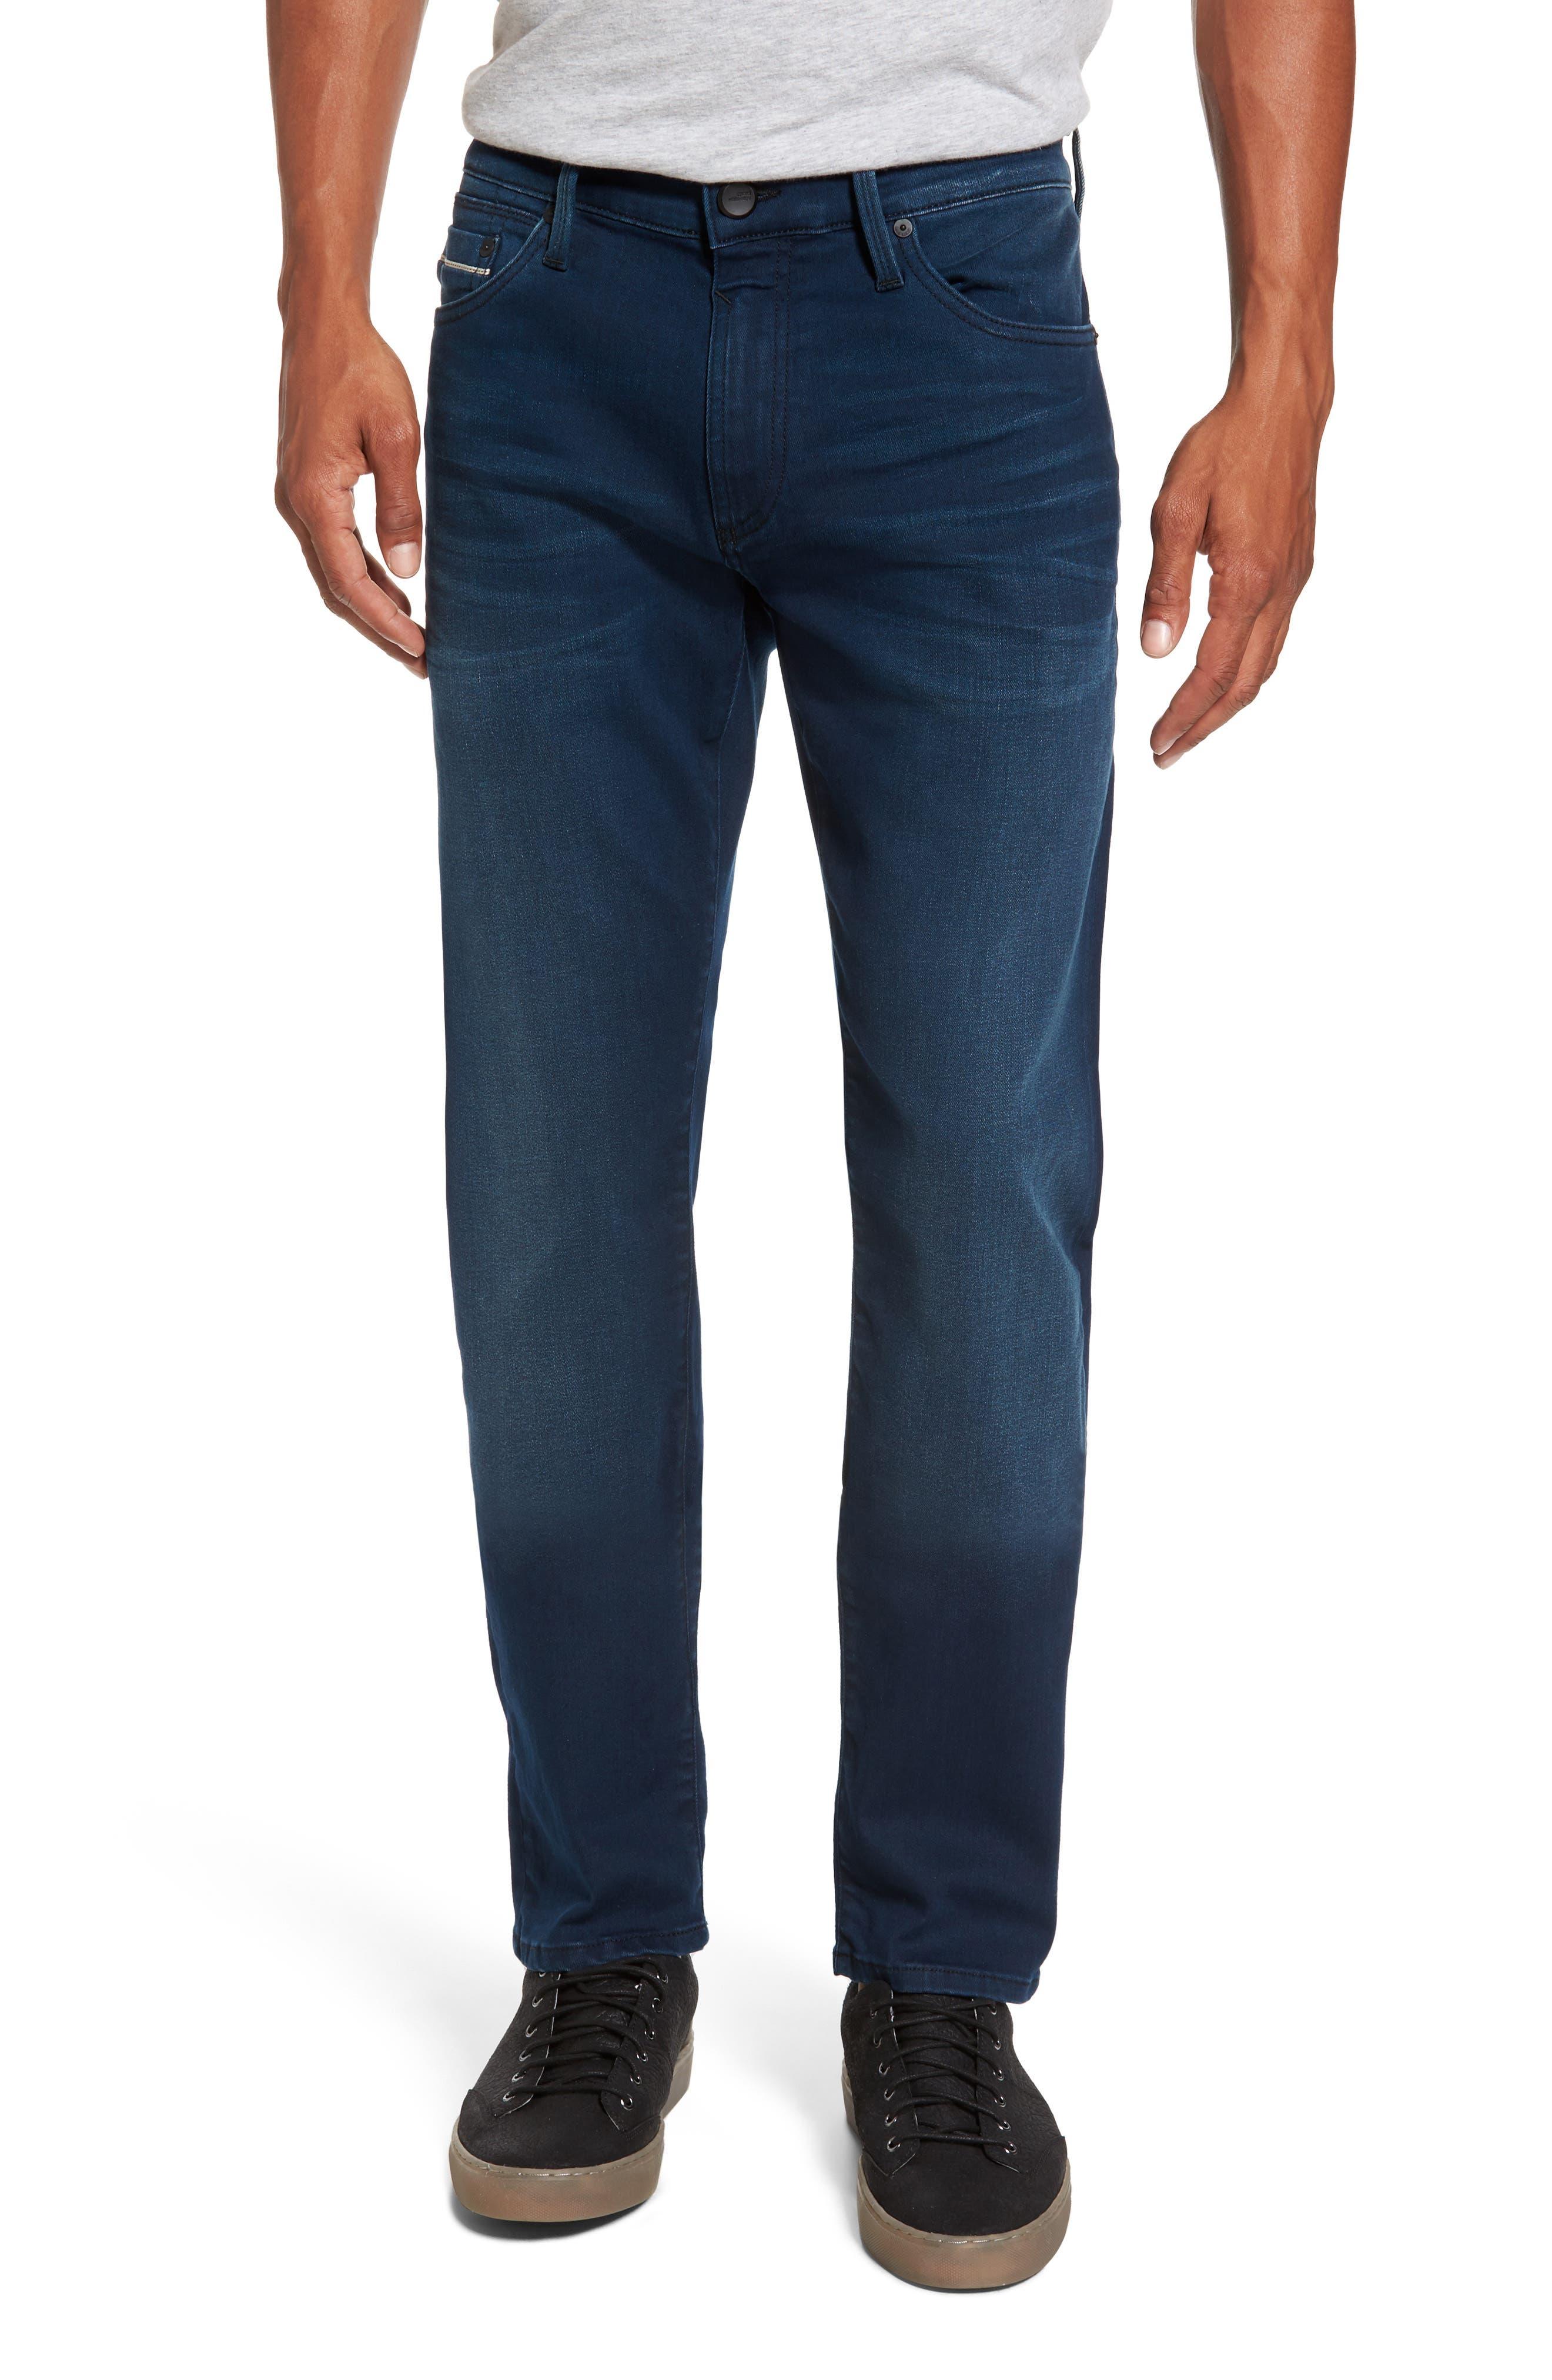 Jake Slim Fit Jeans,                             Main thumbnail 1, color,                             Ink Brushed Williamsburg